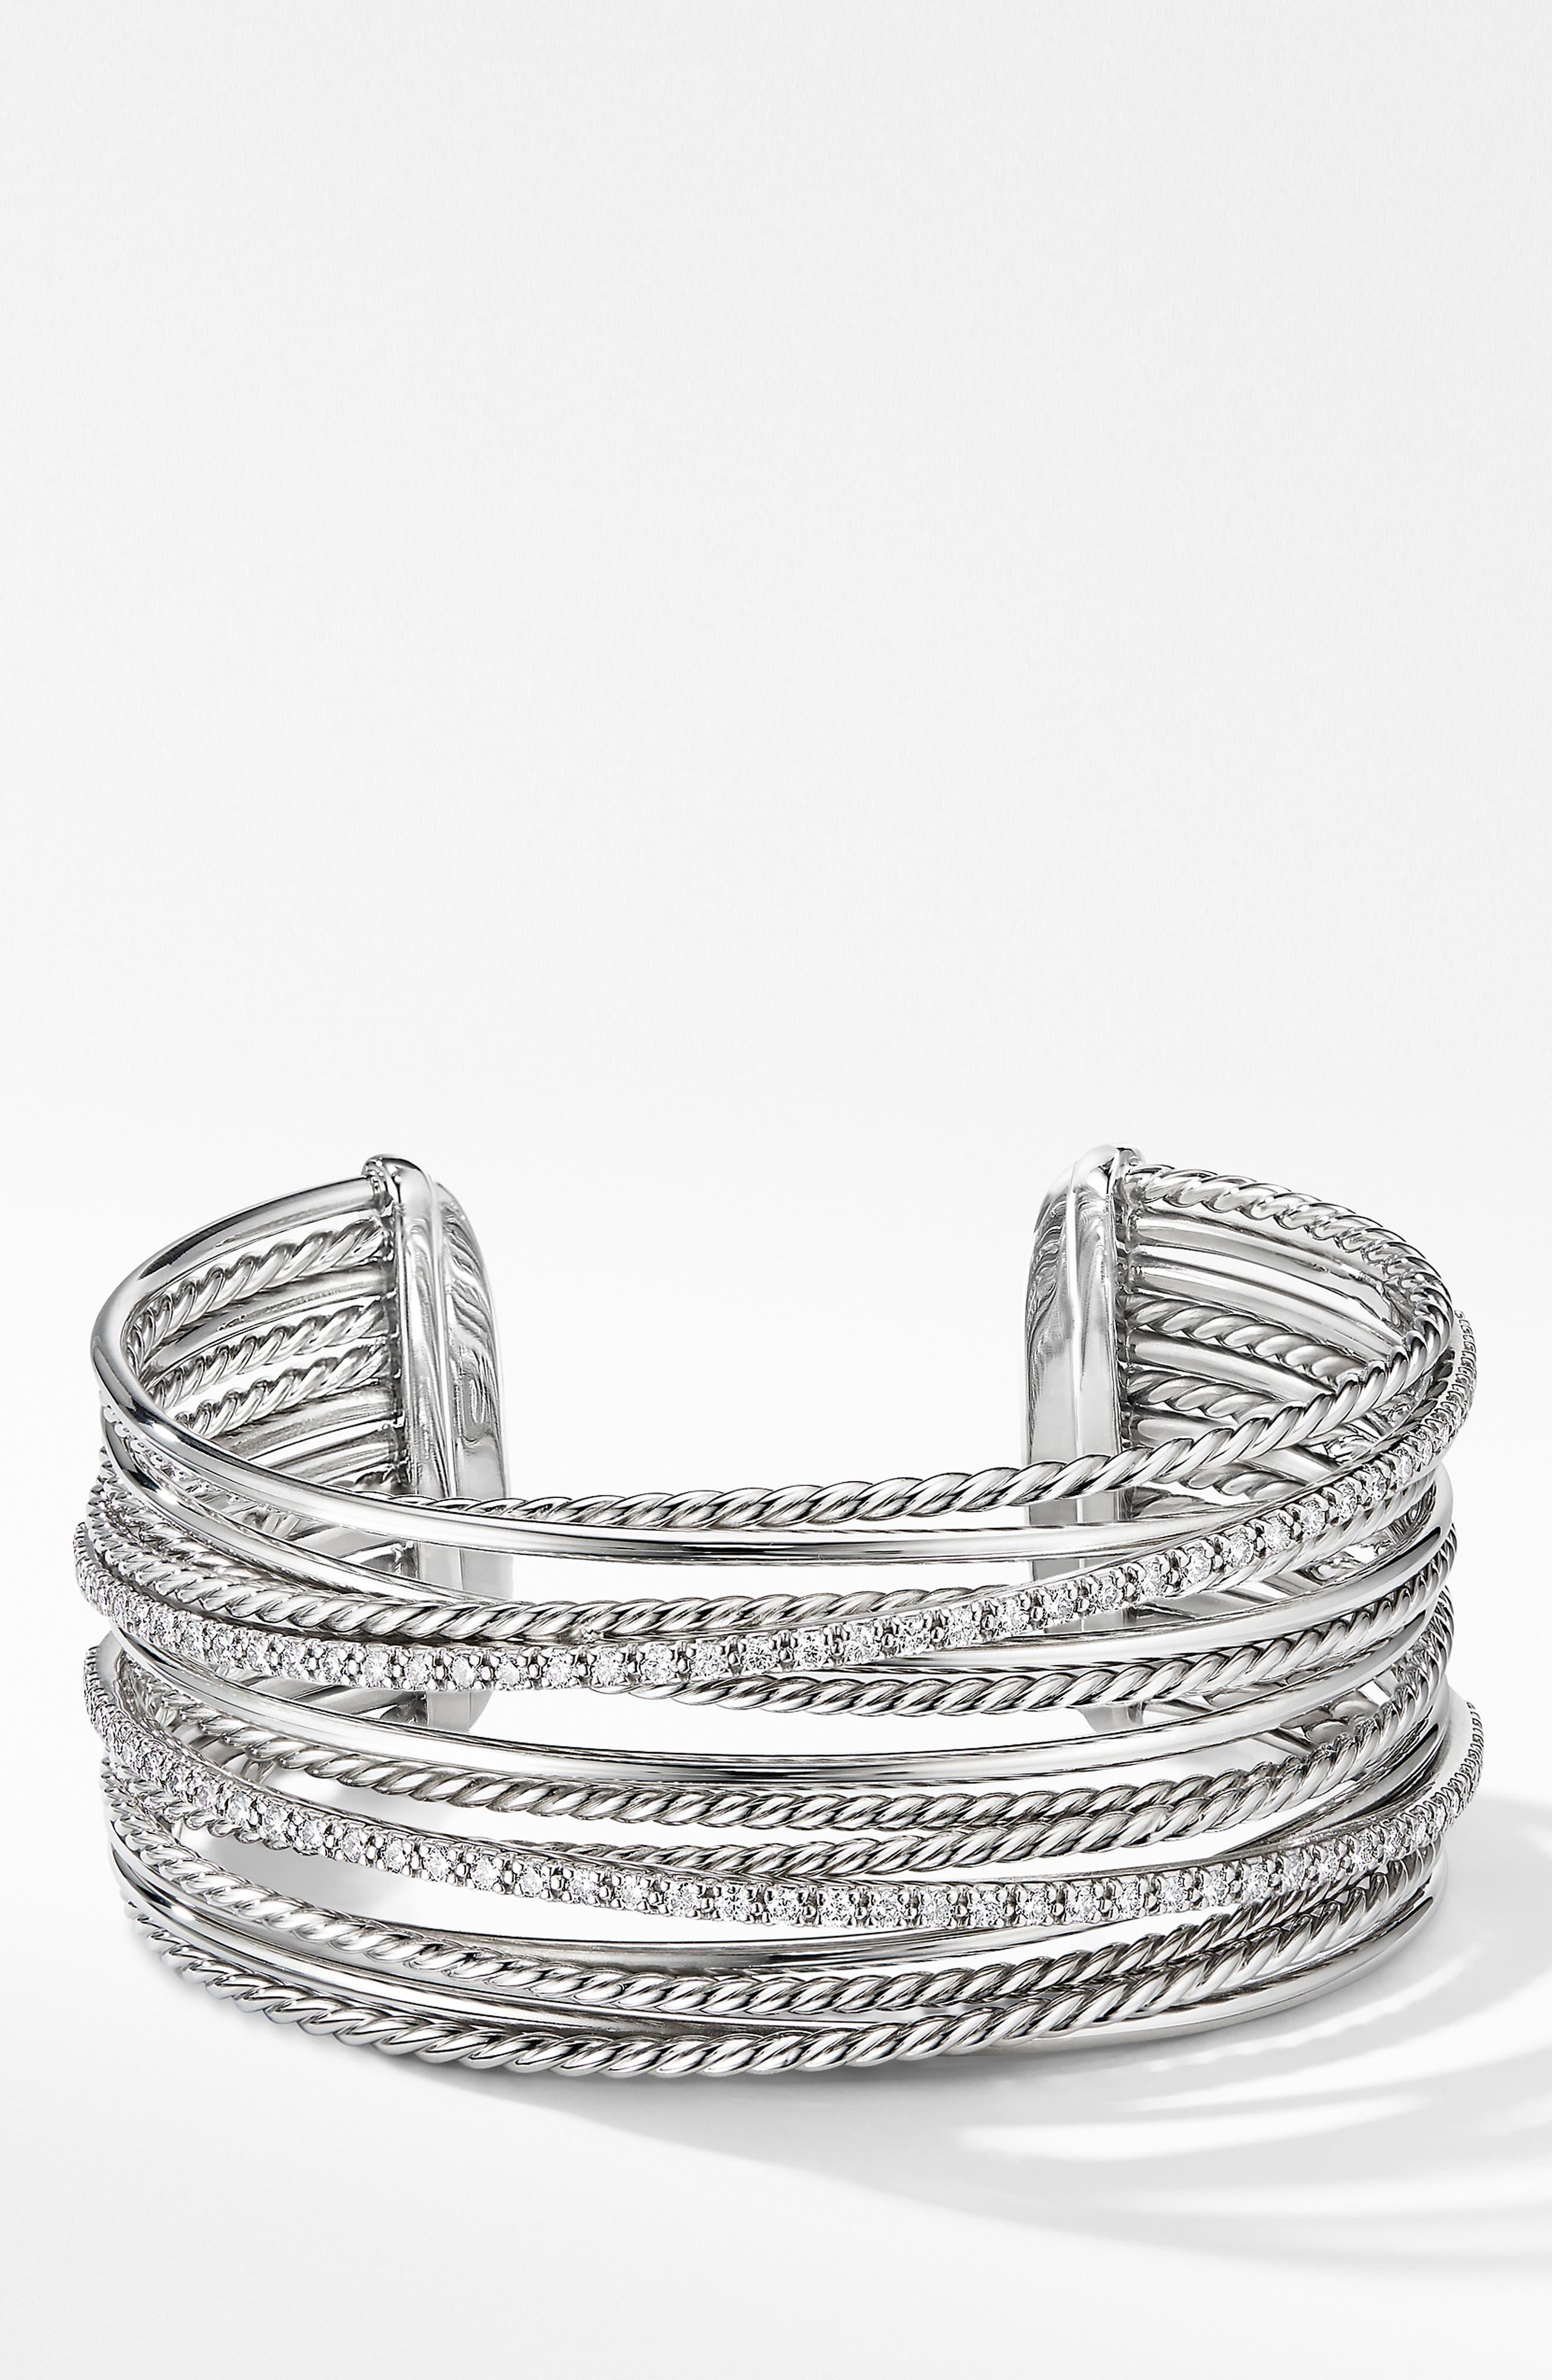 DAVID YURMAN, Crossover Cuff Bracelet with Diamonds, Main thumbnail 1, color, SILVER/ DIAMOND